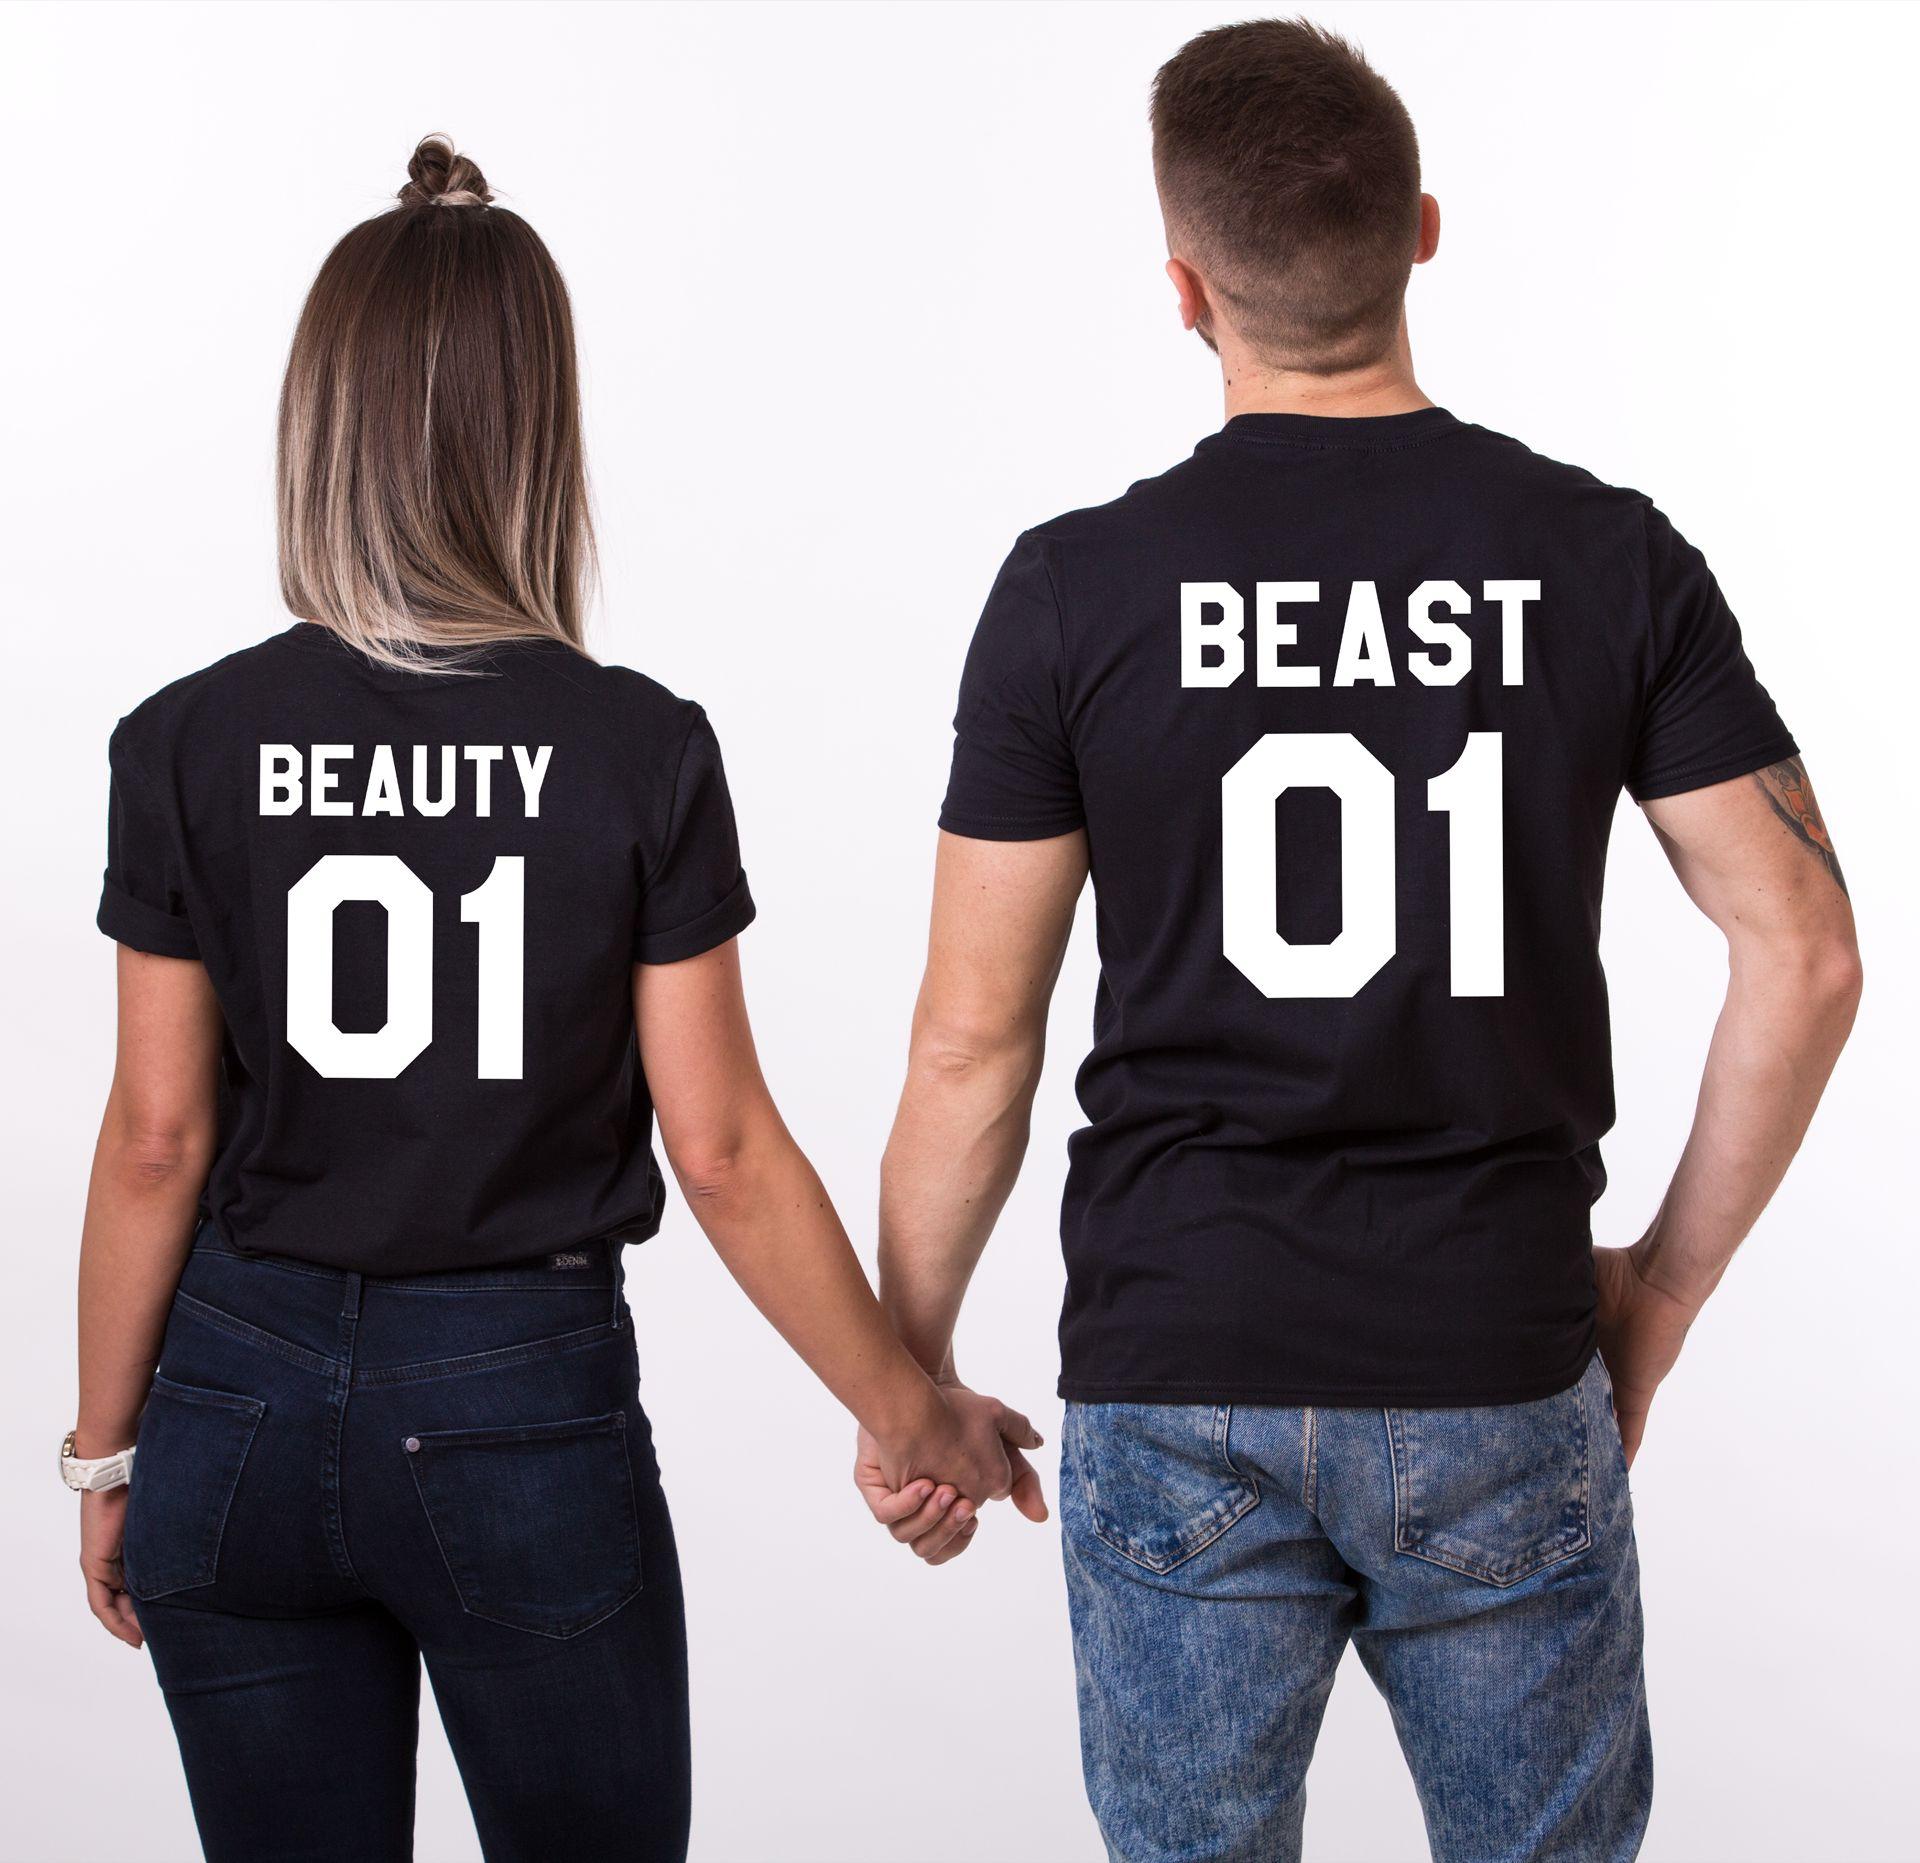 d1eb8d84a0c Beauty 01 Beast 01, Matching Couples Shirts